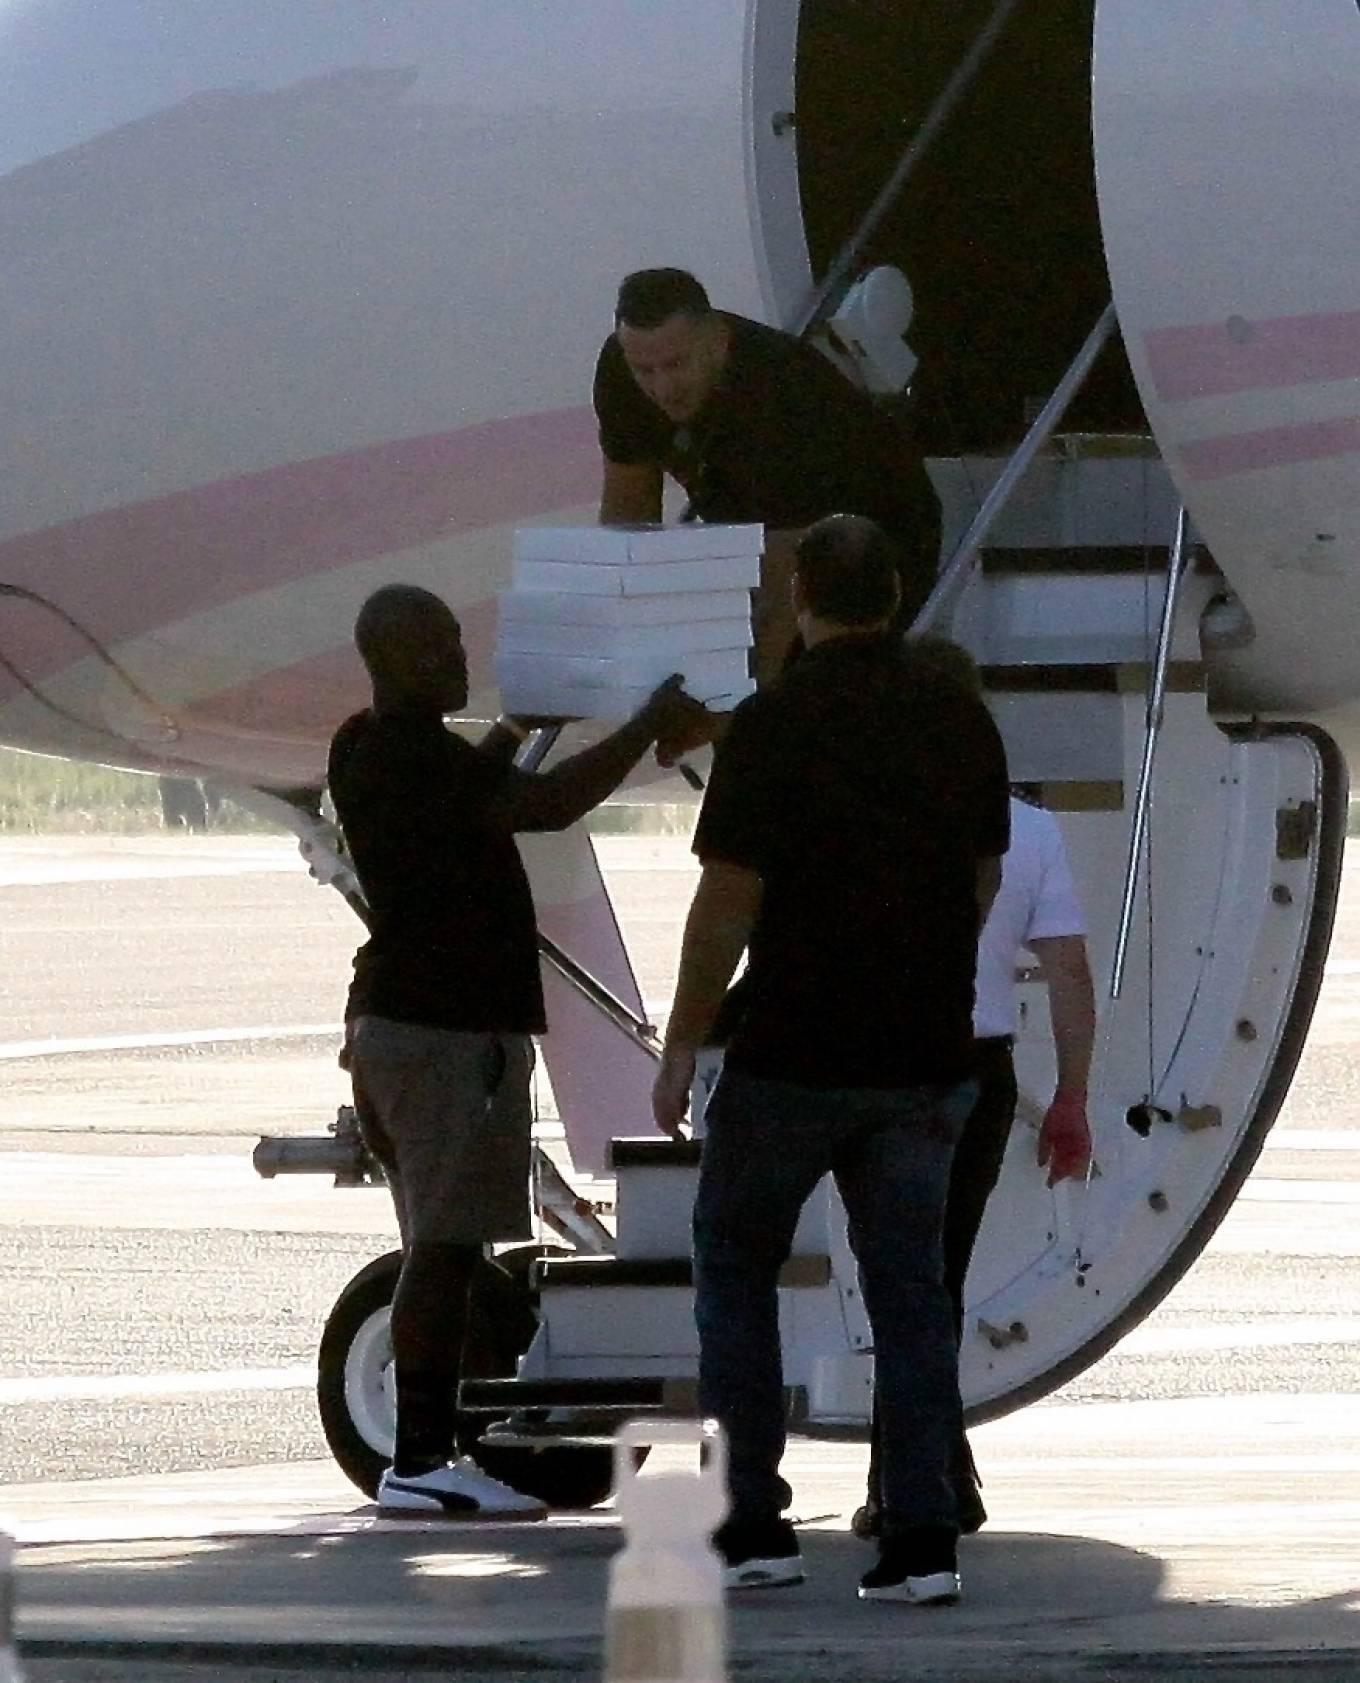 Khloe Kardashian 2020 : Khloe Kardashian and Kourtney Kardashian – Pictured boarding Kylie Jenners private jet in Van Nuys-11